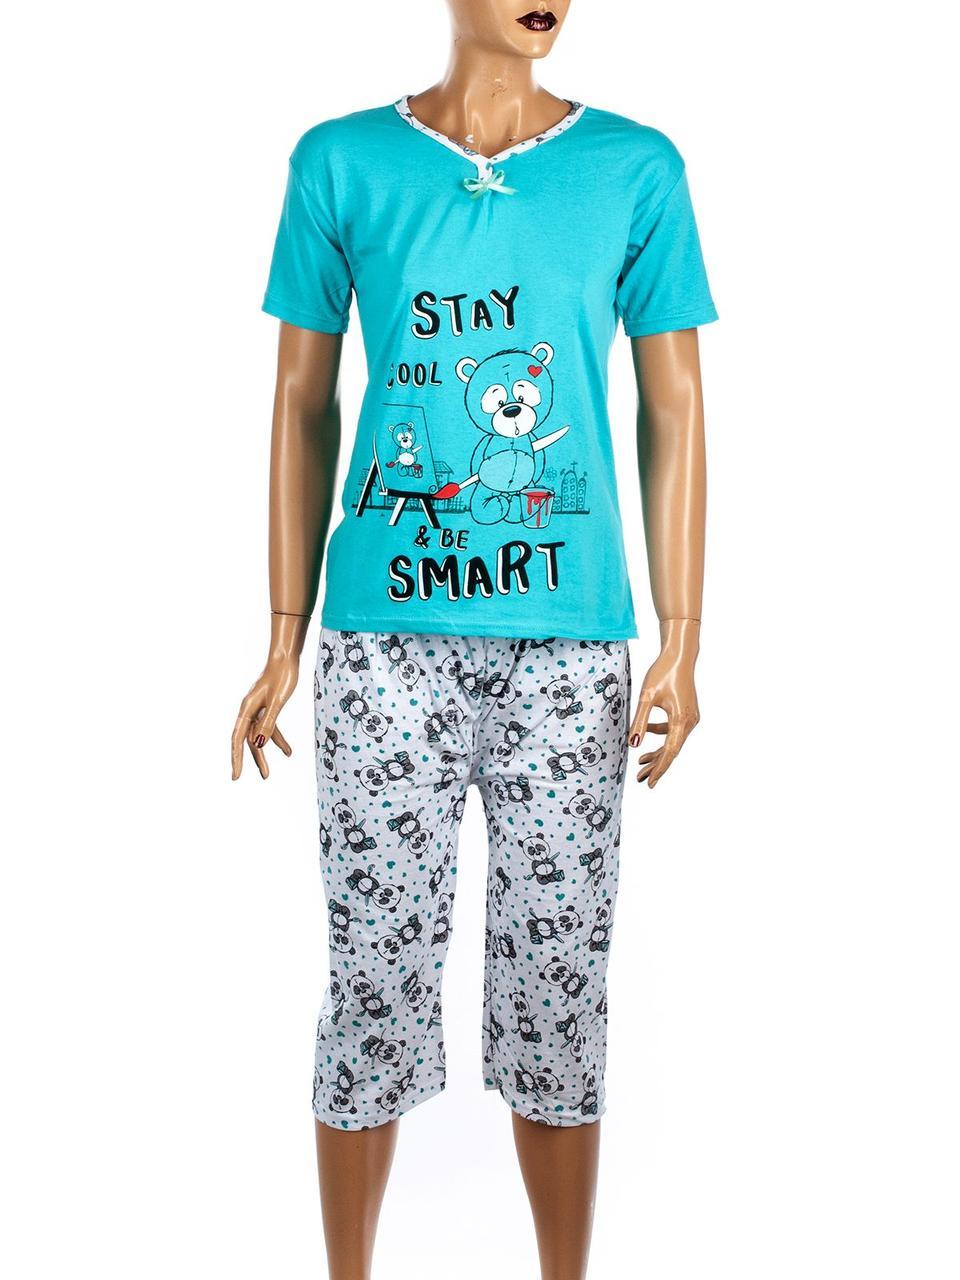 Женская пижама Stay cool